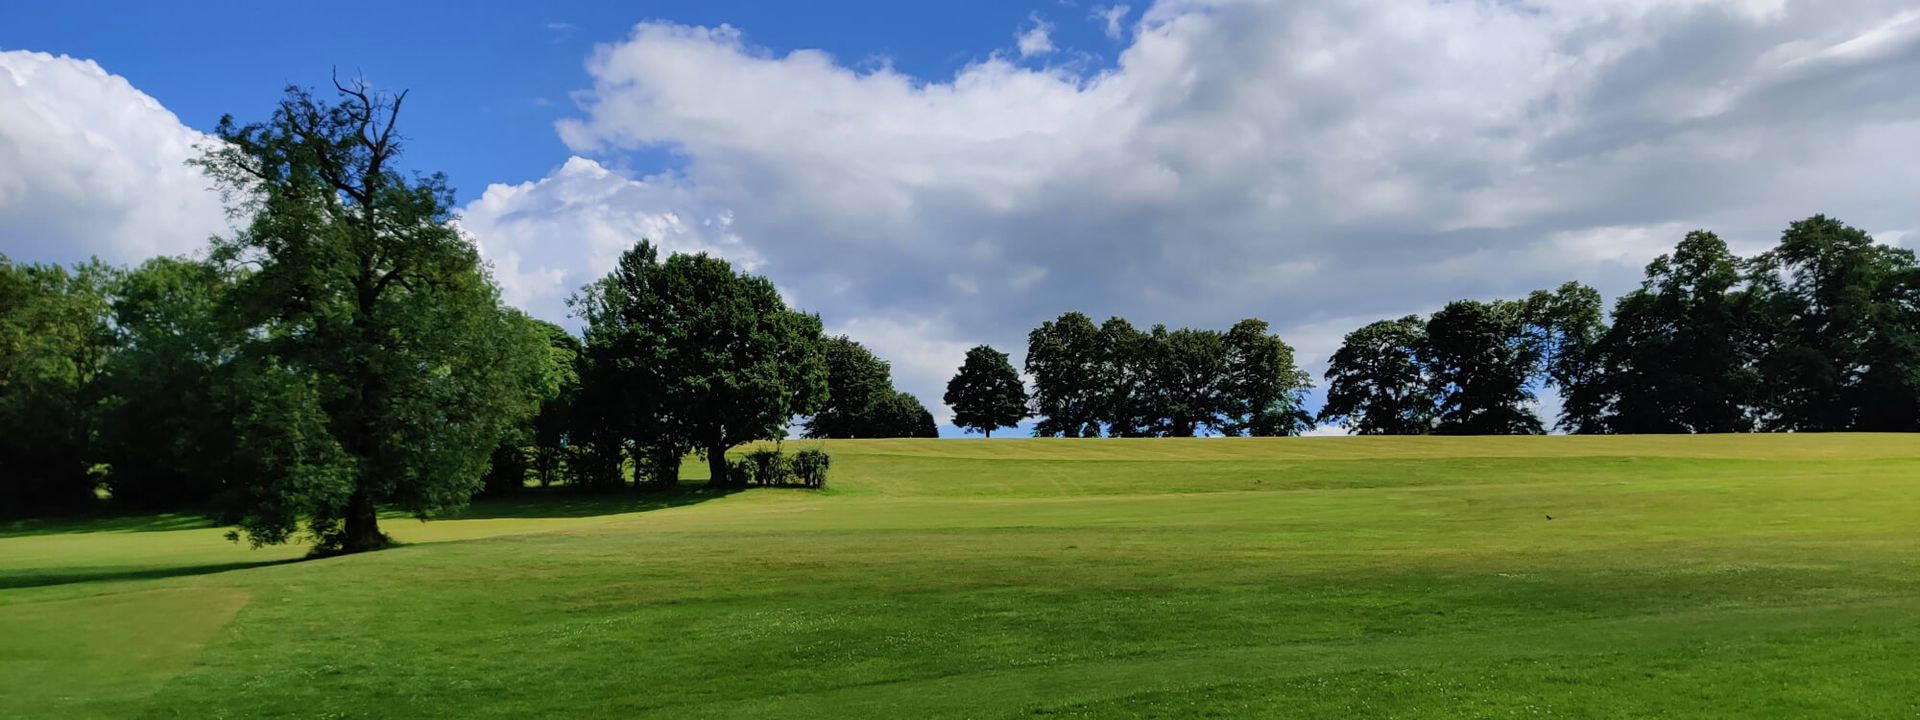 Gotts Park rolling grassy field